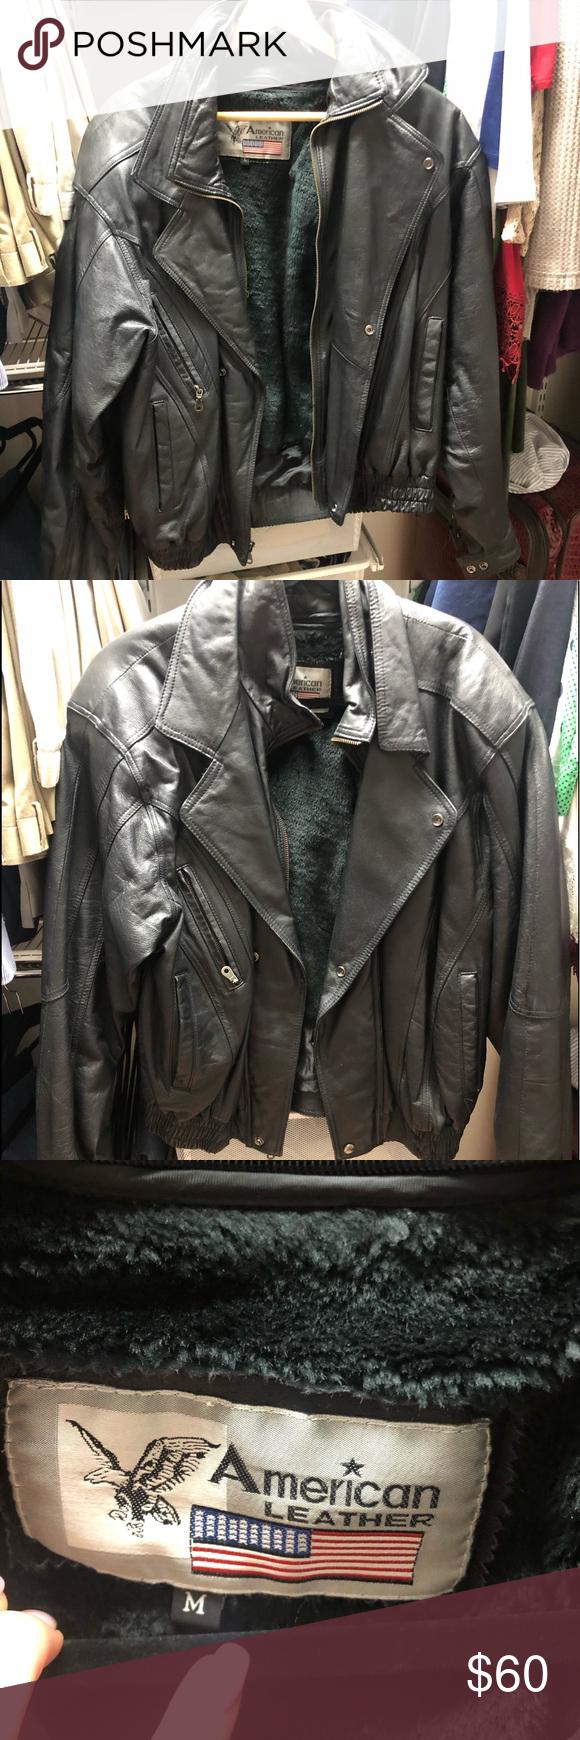 American Leather Women S Black Jacket American Leather Women S Black Jacket Genuine Leather 100 Polyester S Womens Black Jacket Leather Women American Leather [ 1740 x 580 Pixel ]